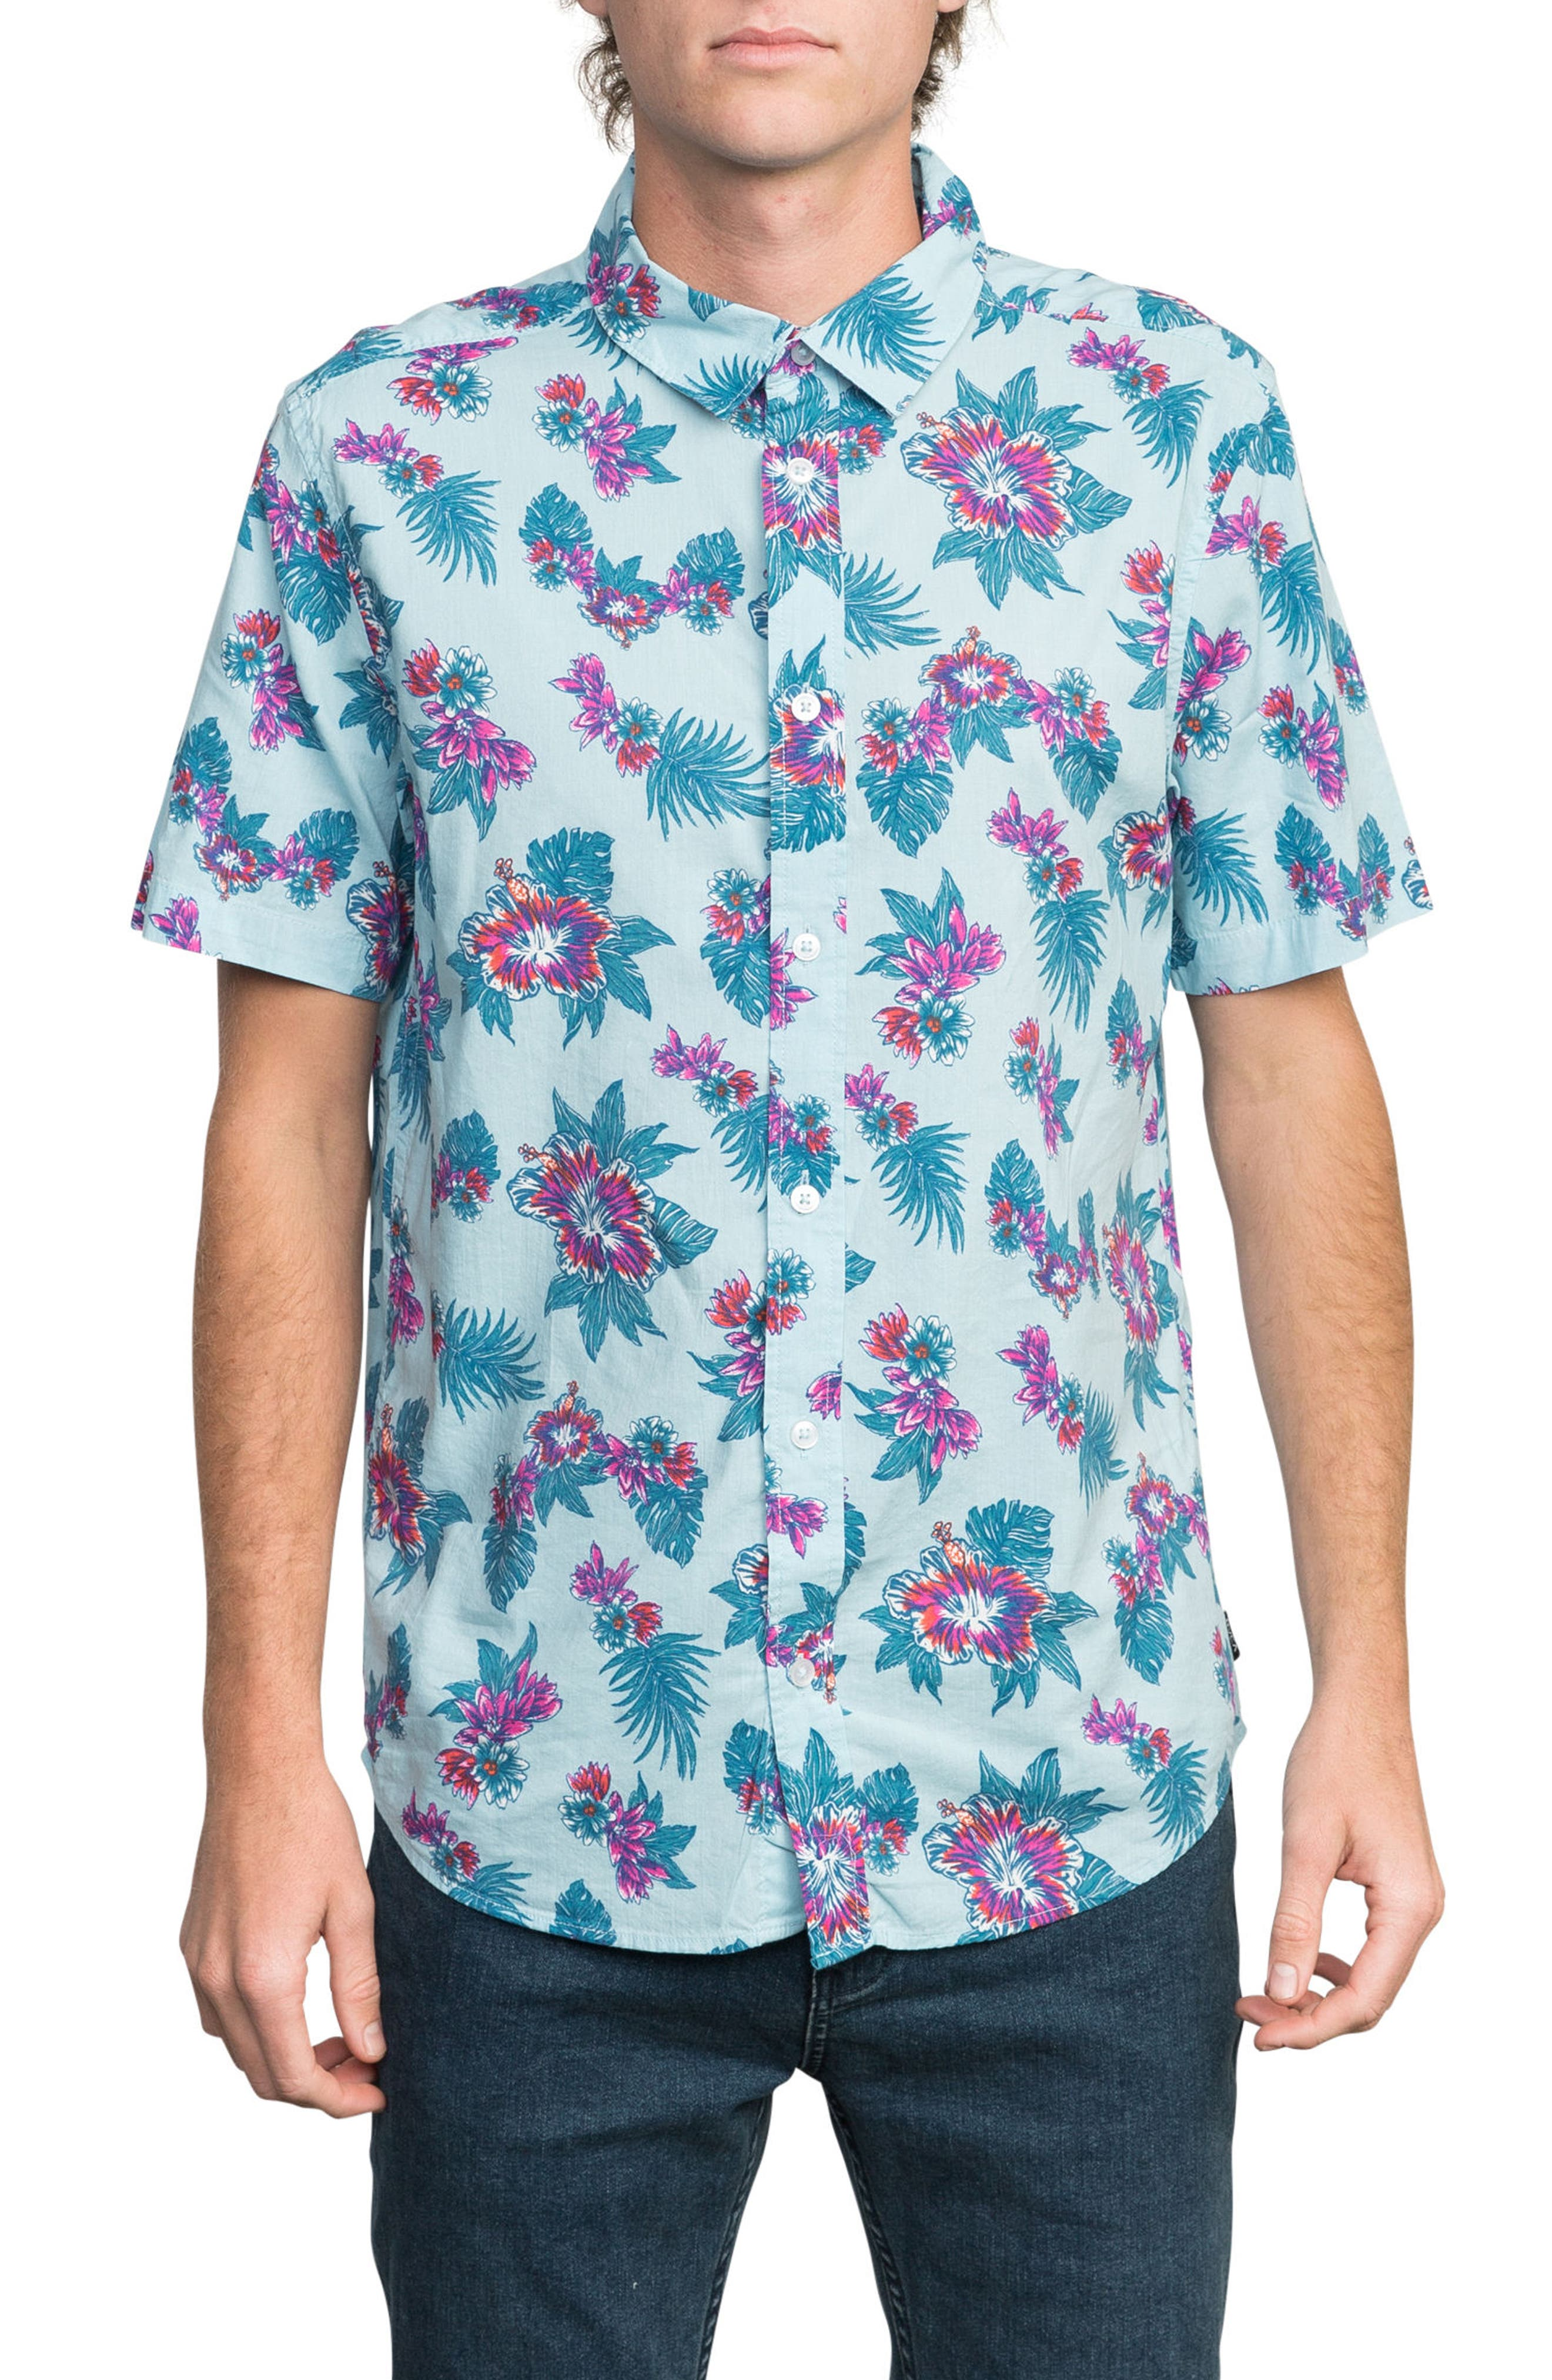 McMillan Floral Woven Shirt,                         Main,                         color, Blue Floral